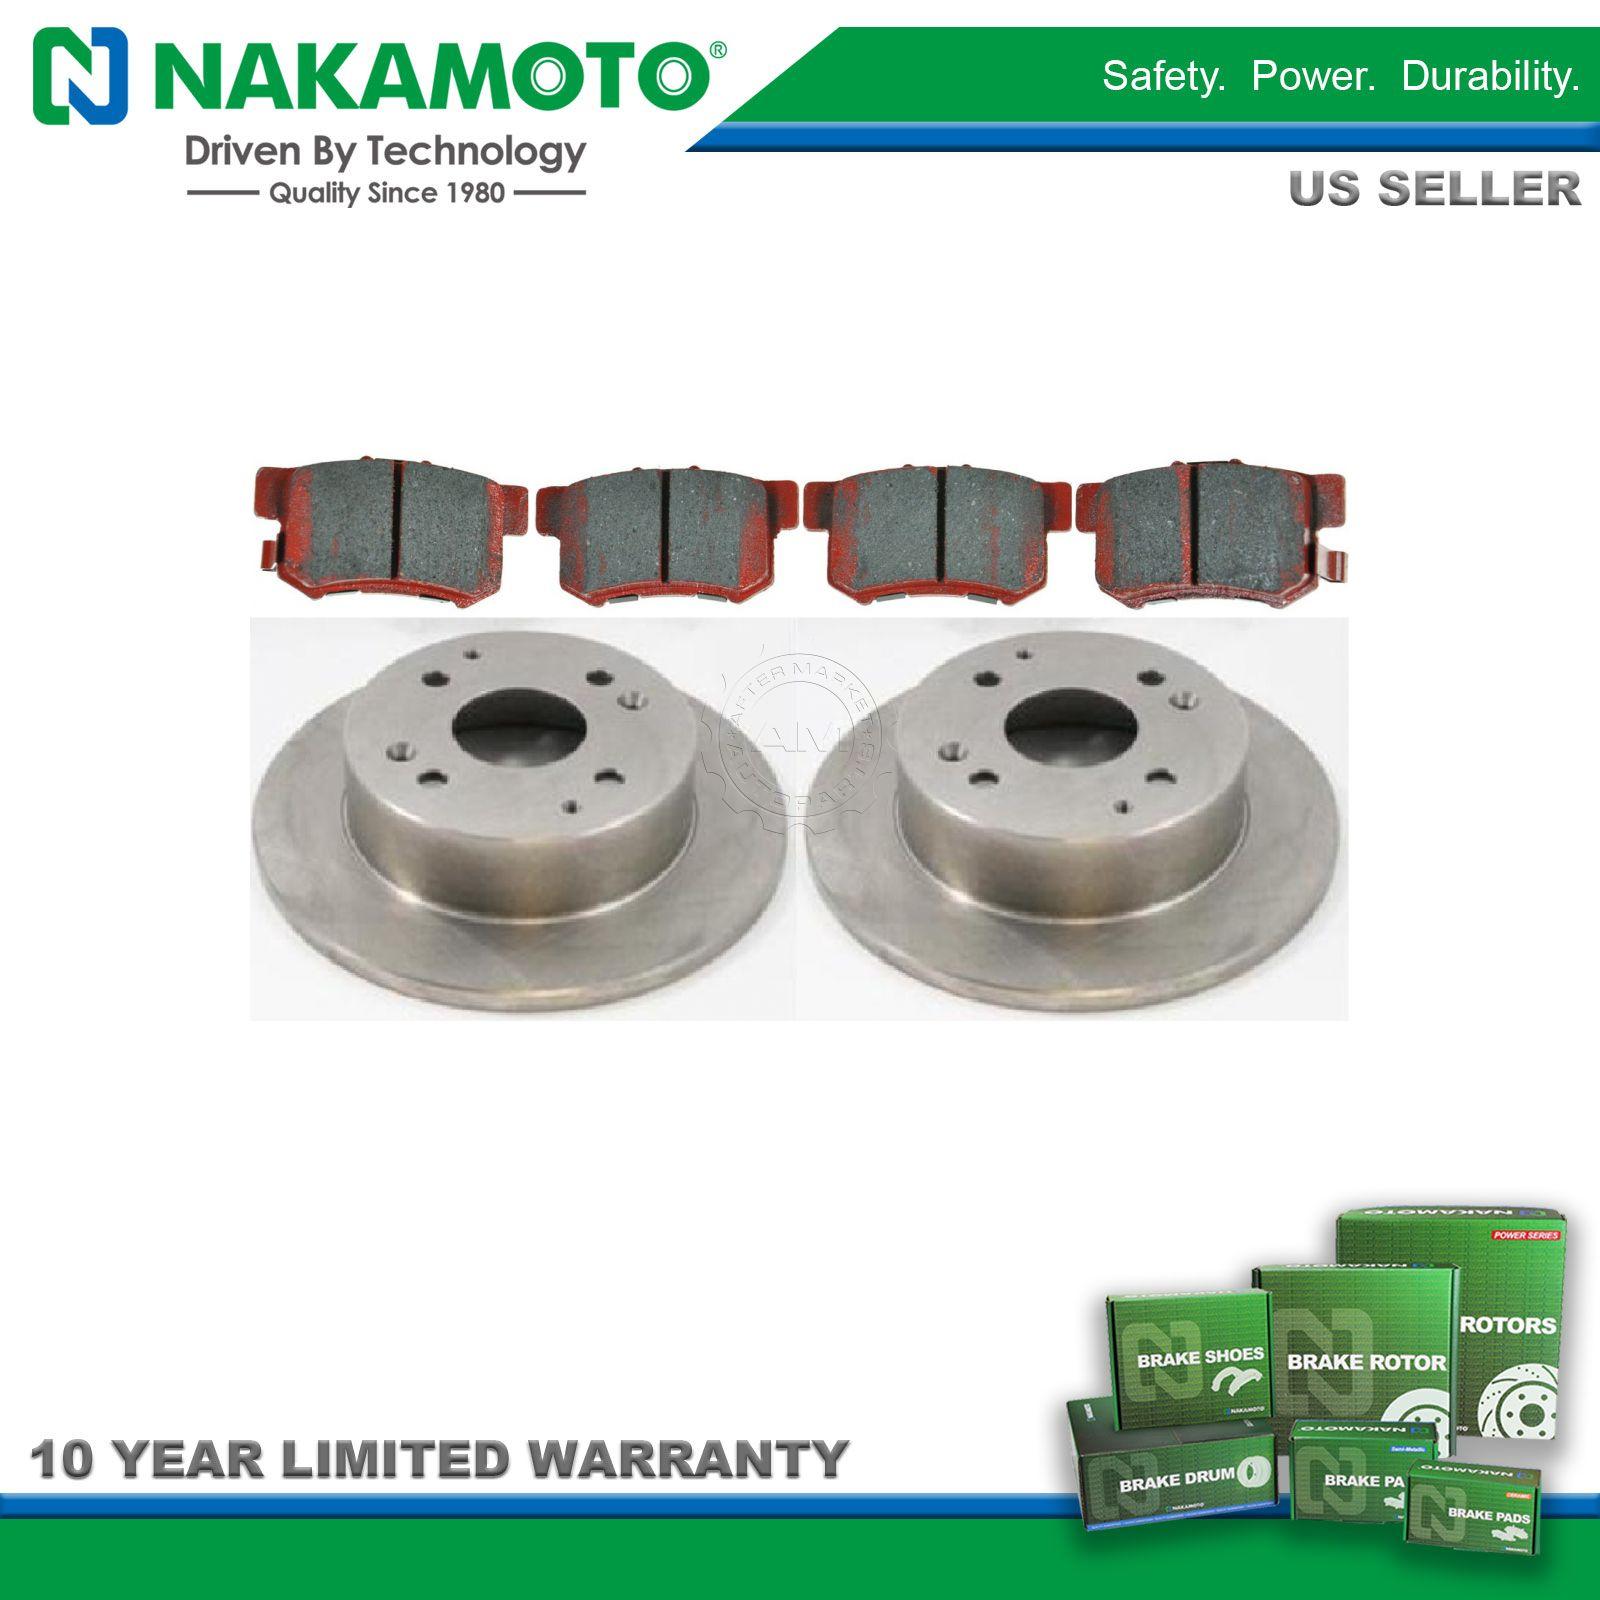 Nakamoto Ceramic Rear Brake Pad & Rotor Kit for Acura CL Honda Accord NEW